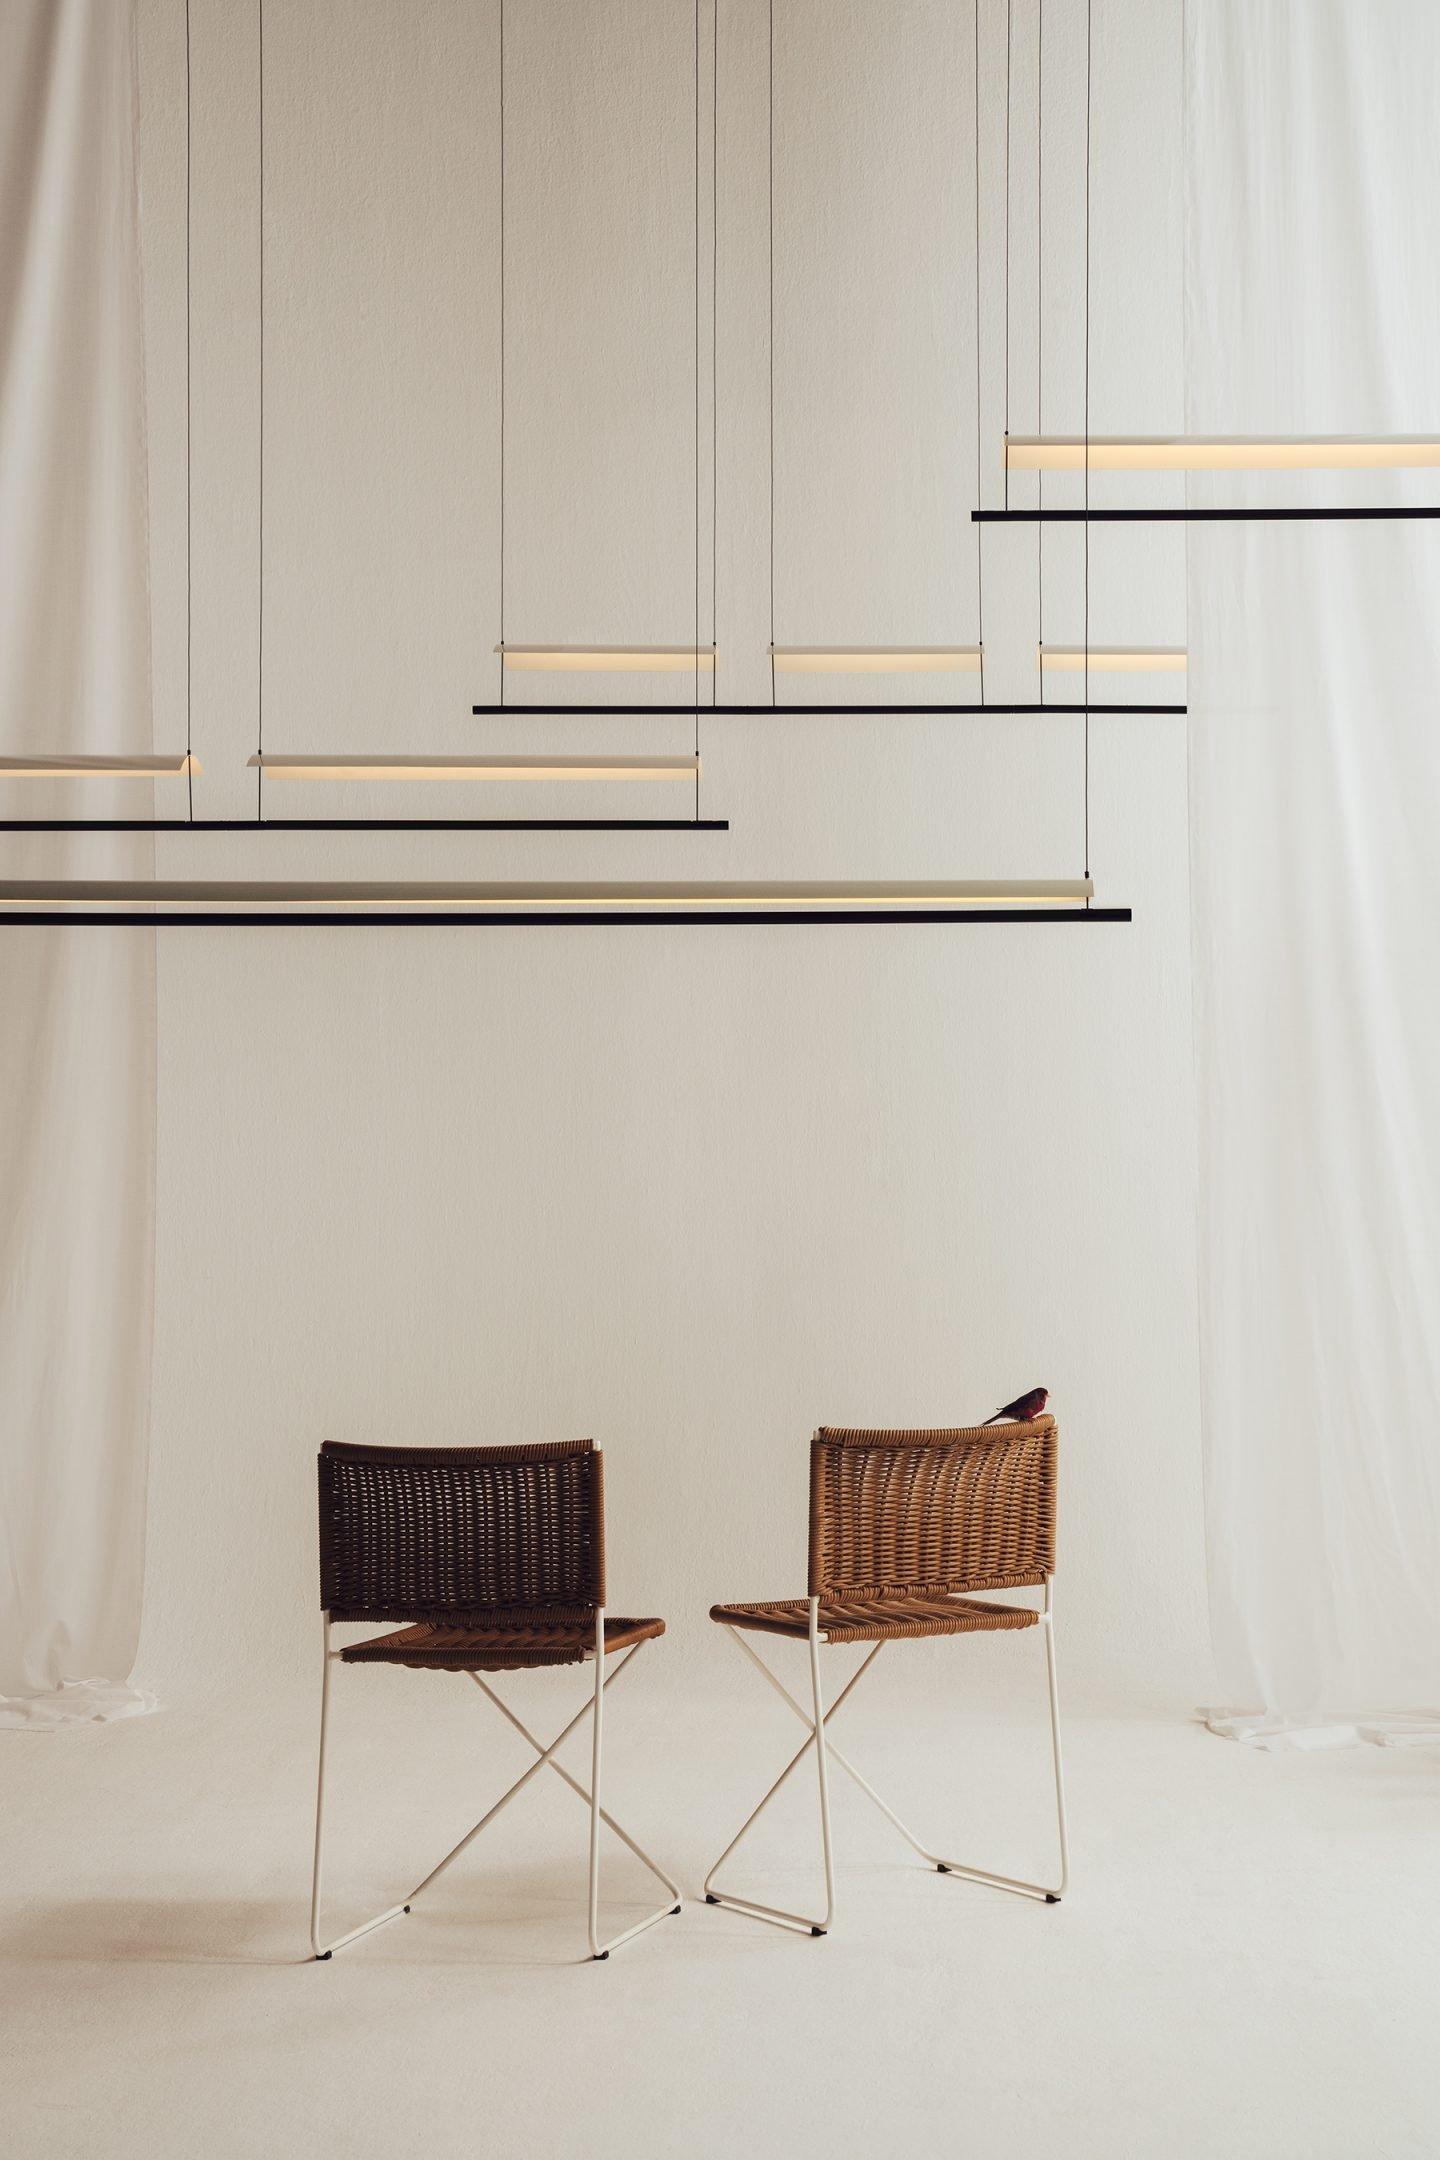 IGNANT-Design-SantaCole-AntoniArola-Lamina-12